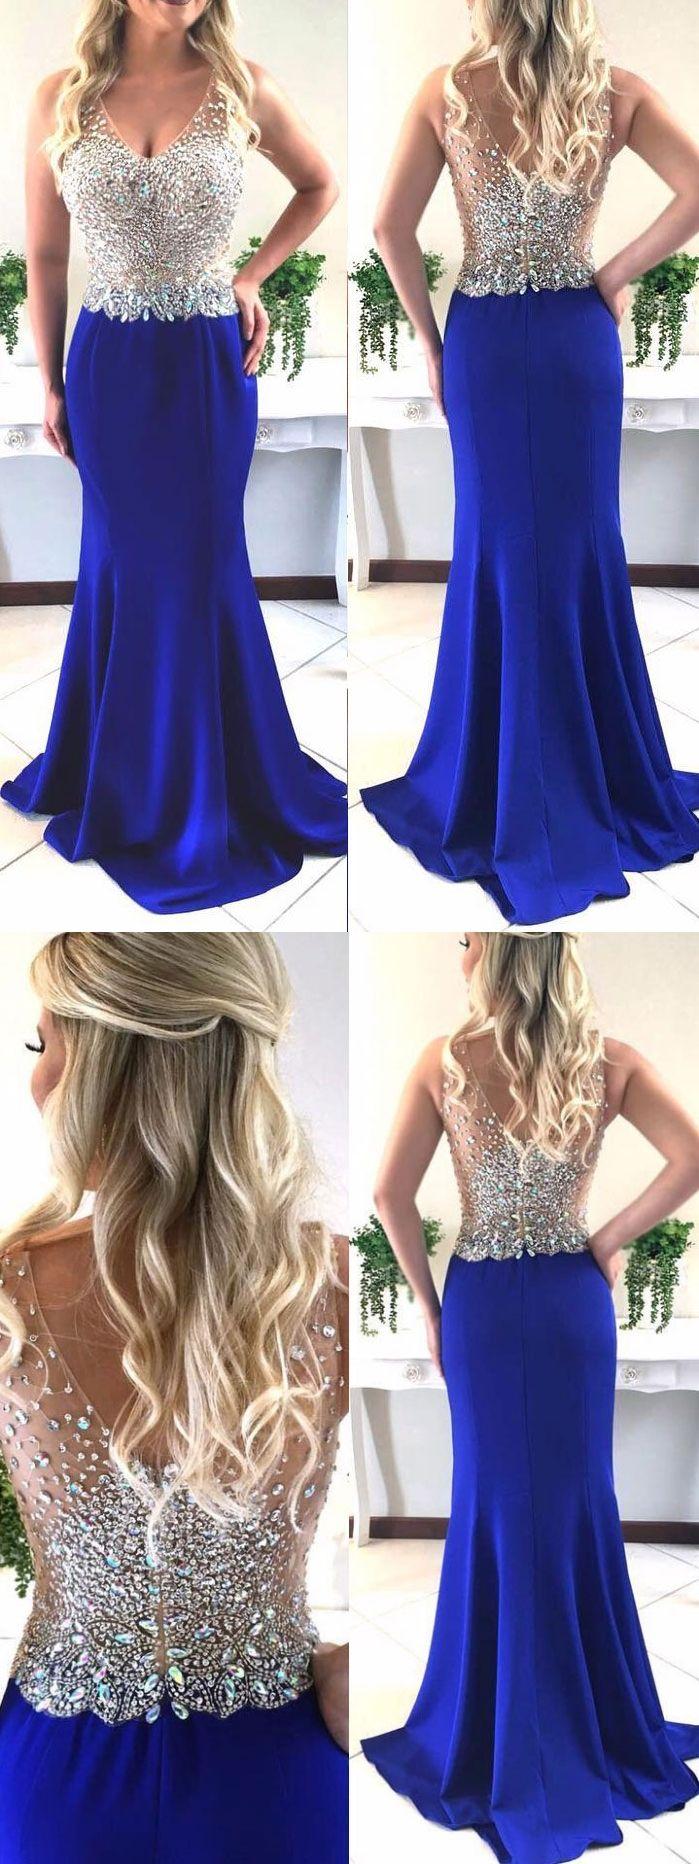 Mermaid vneck sweep train satin sequined royal blue prom dress